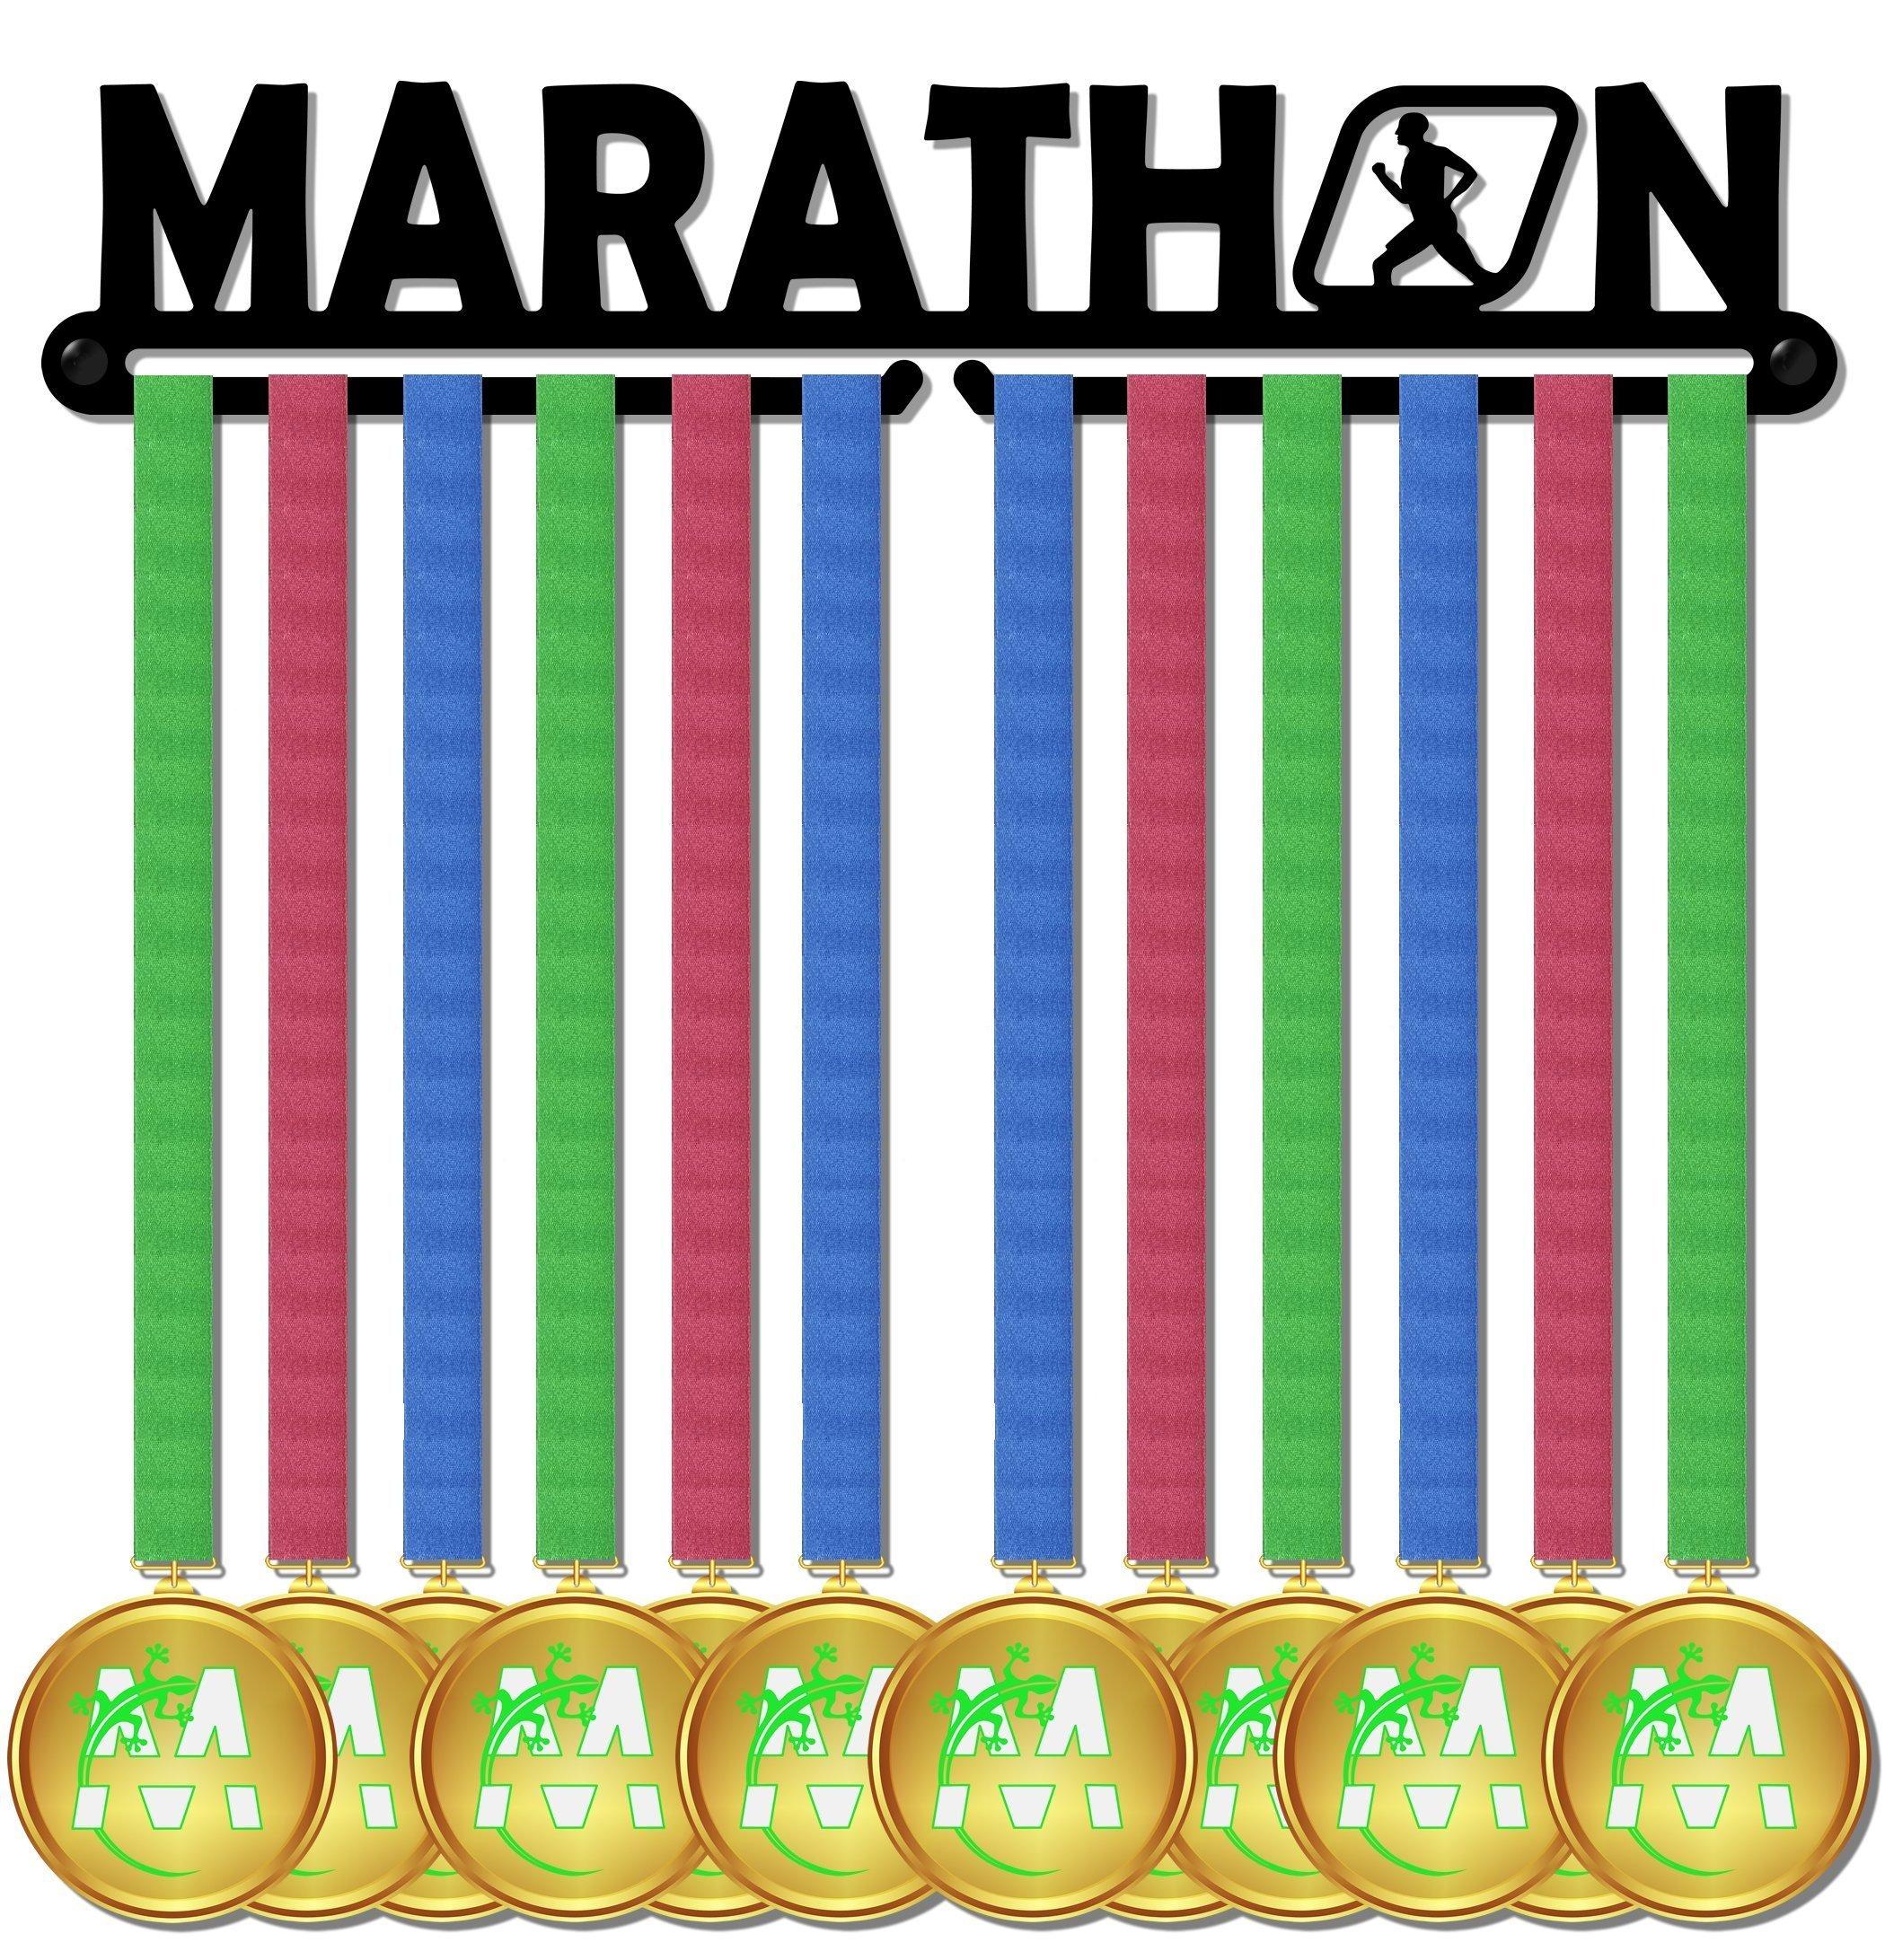 Medal Display medagliere da muro madal hanger marathon design